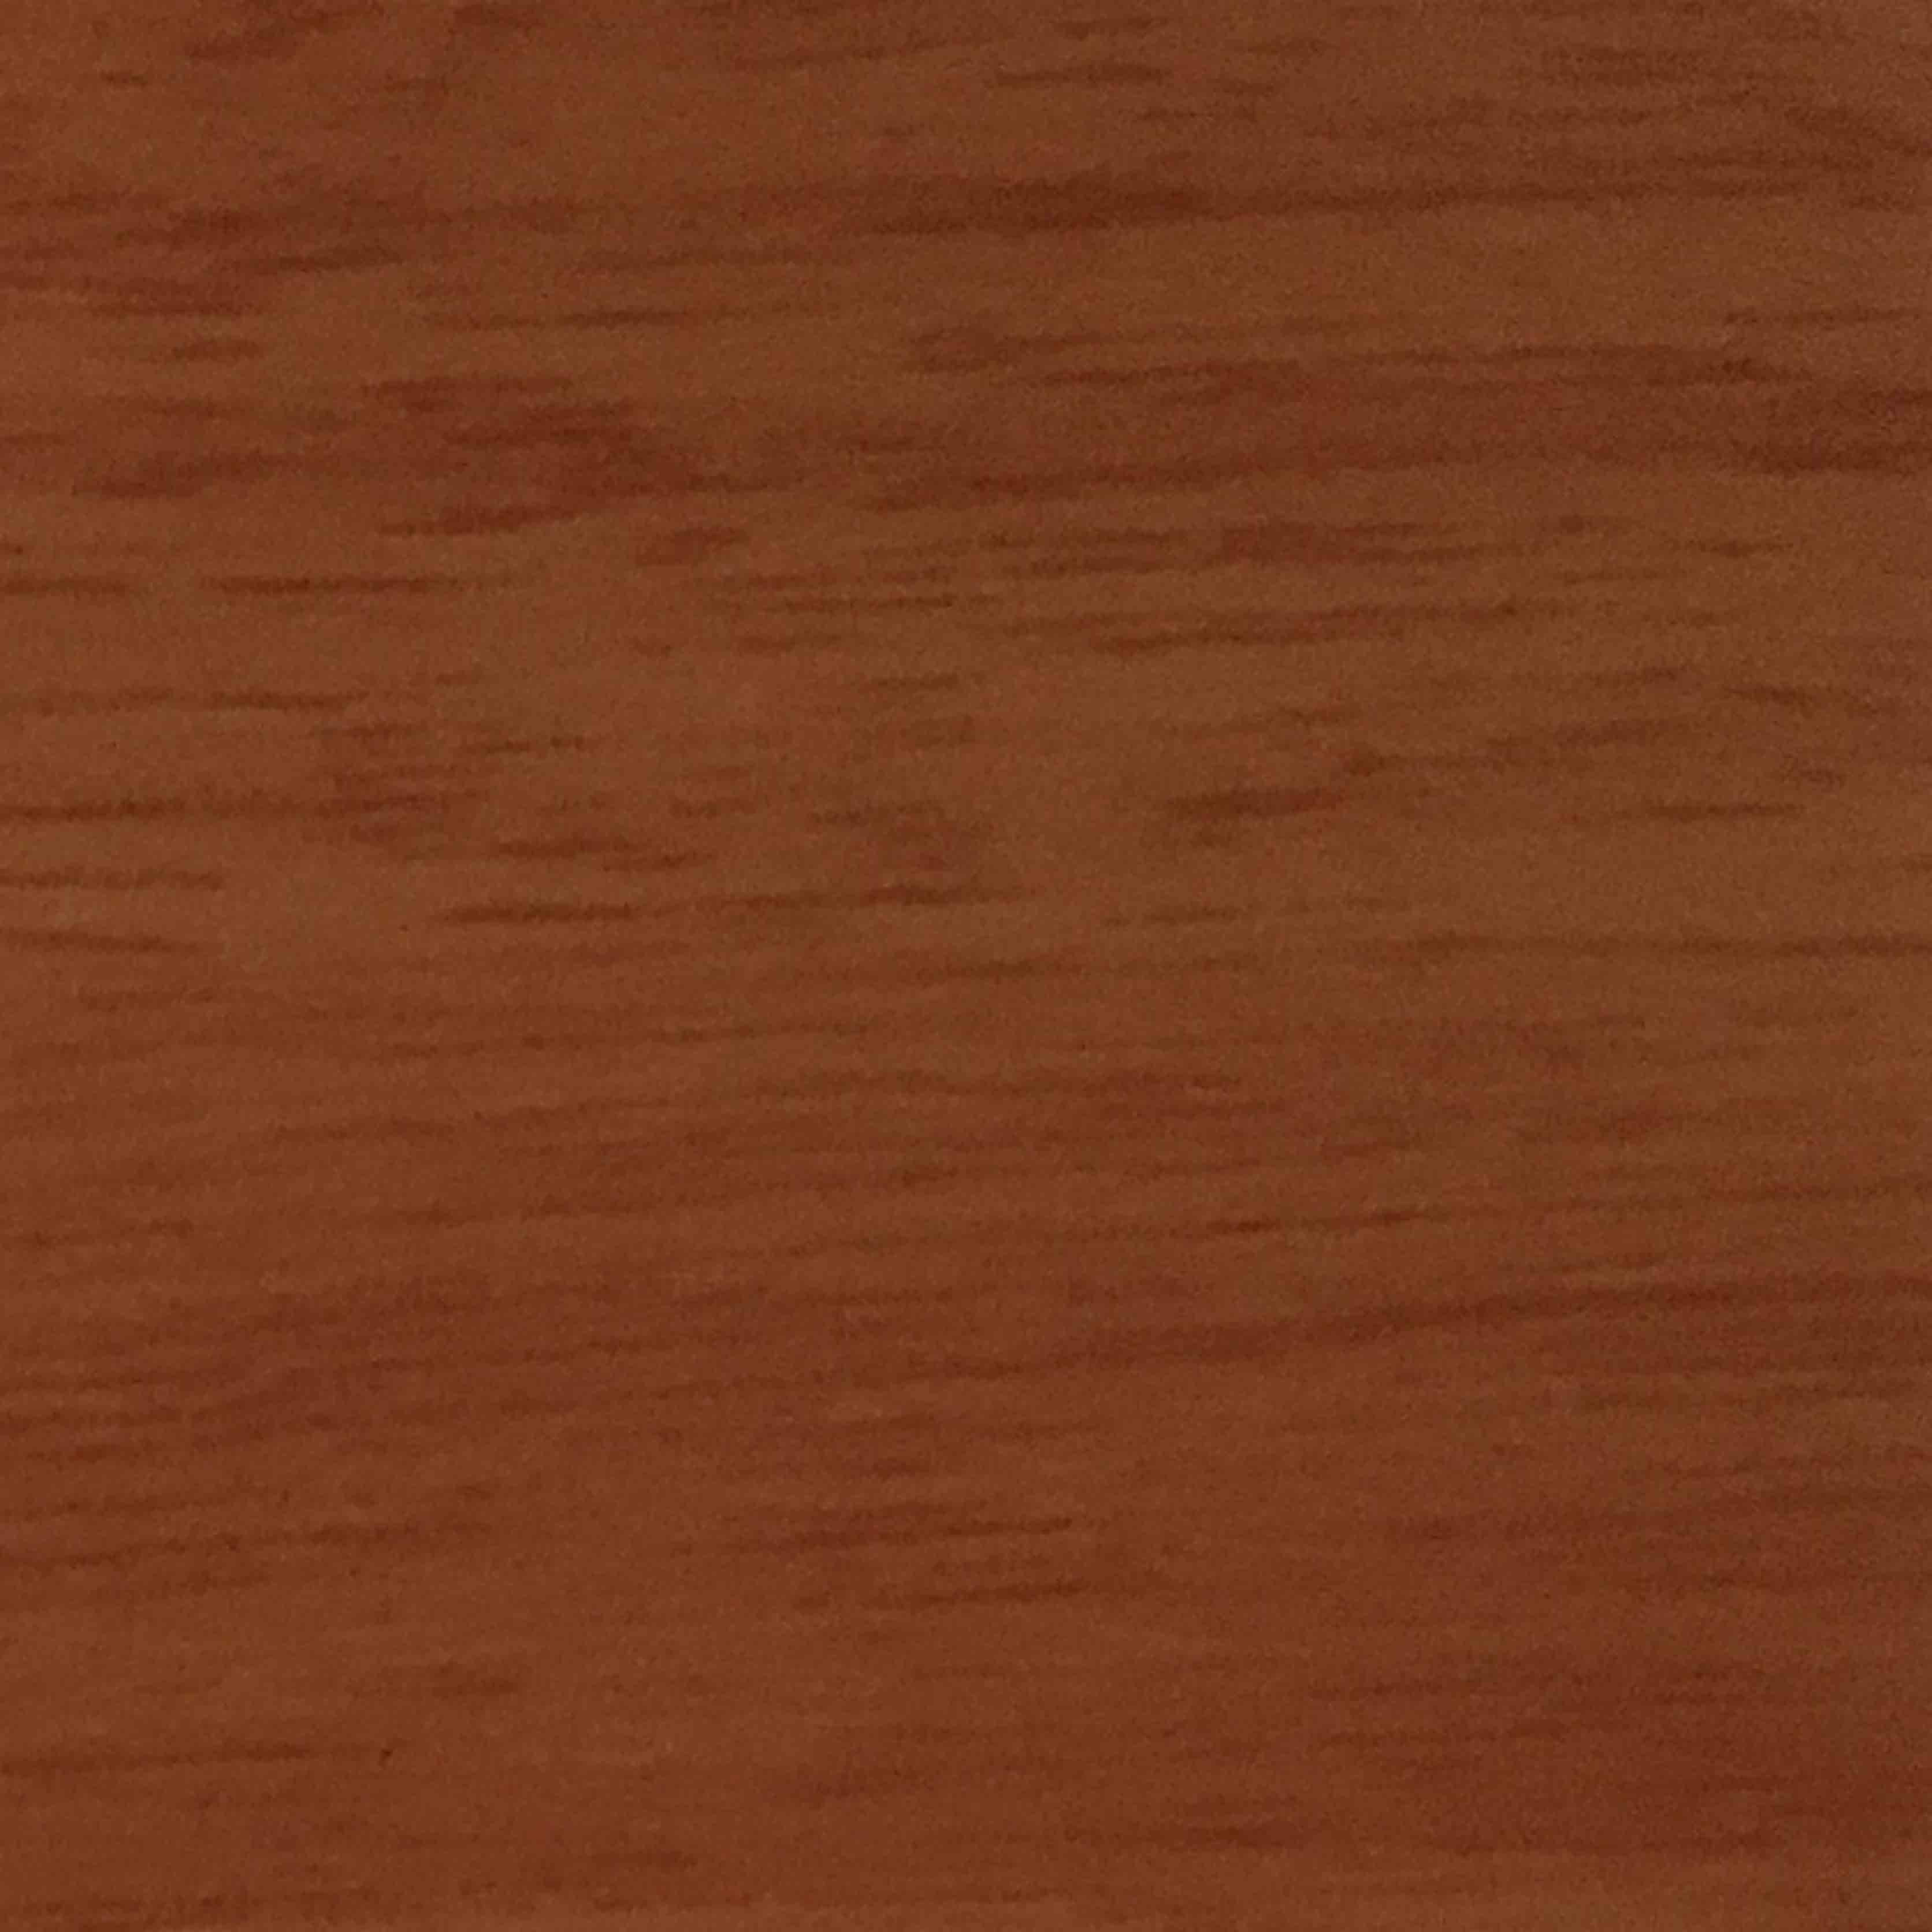 Decal vân gỗ - 5611-28